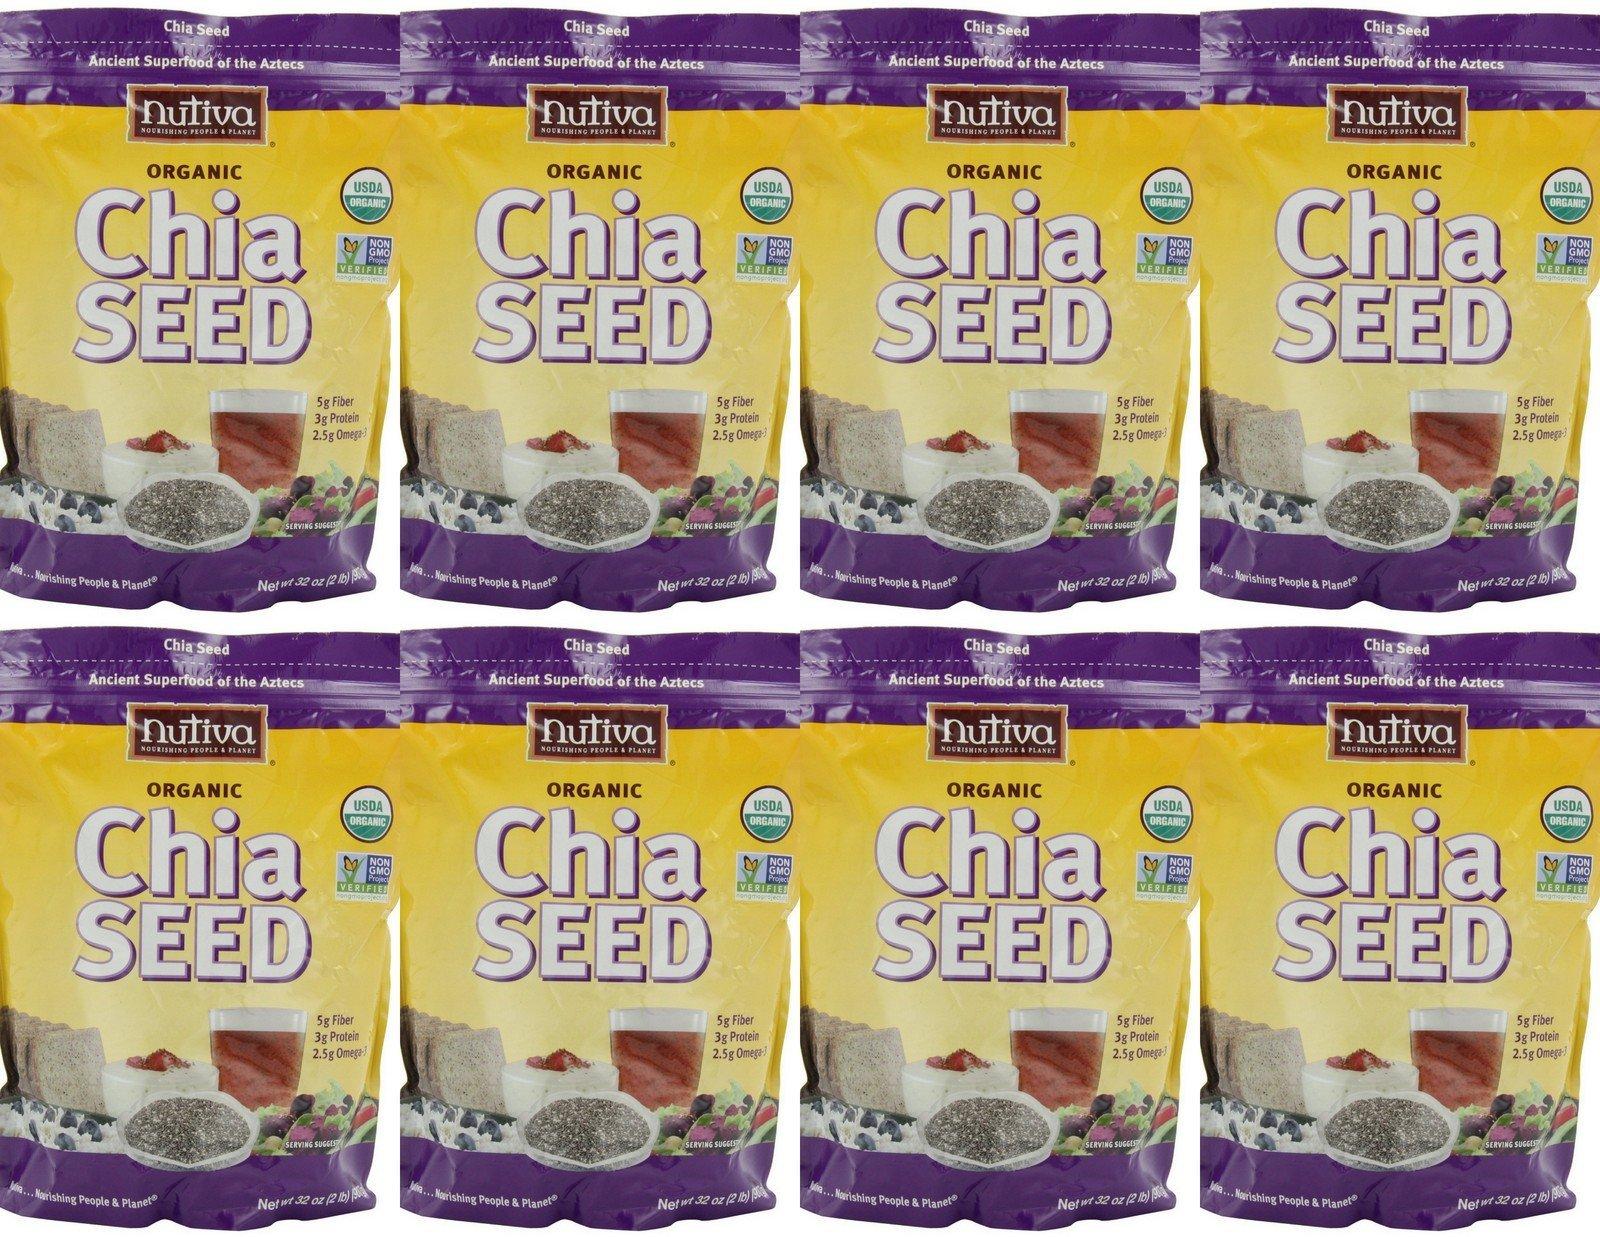 8 x 32oz Nutiva Organic Chia Seed (16 Pounds Total) Vital Nourishment Fiber Antioxidants Health